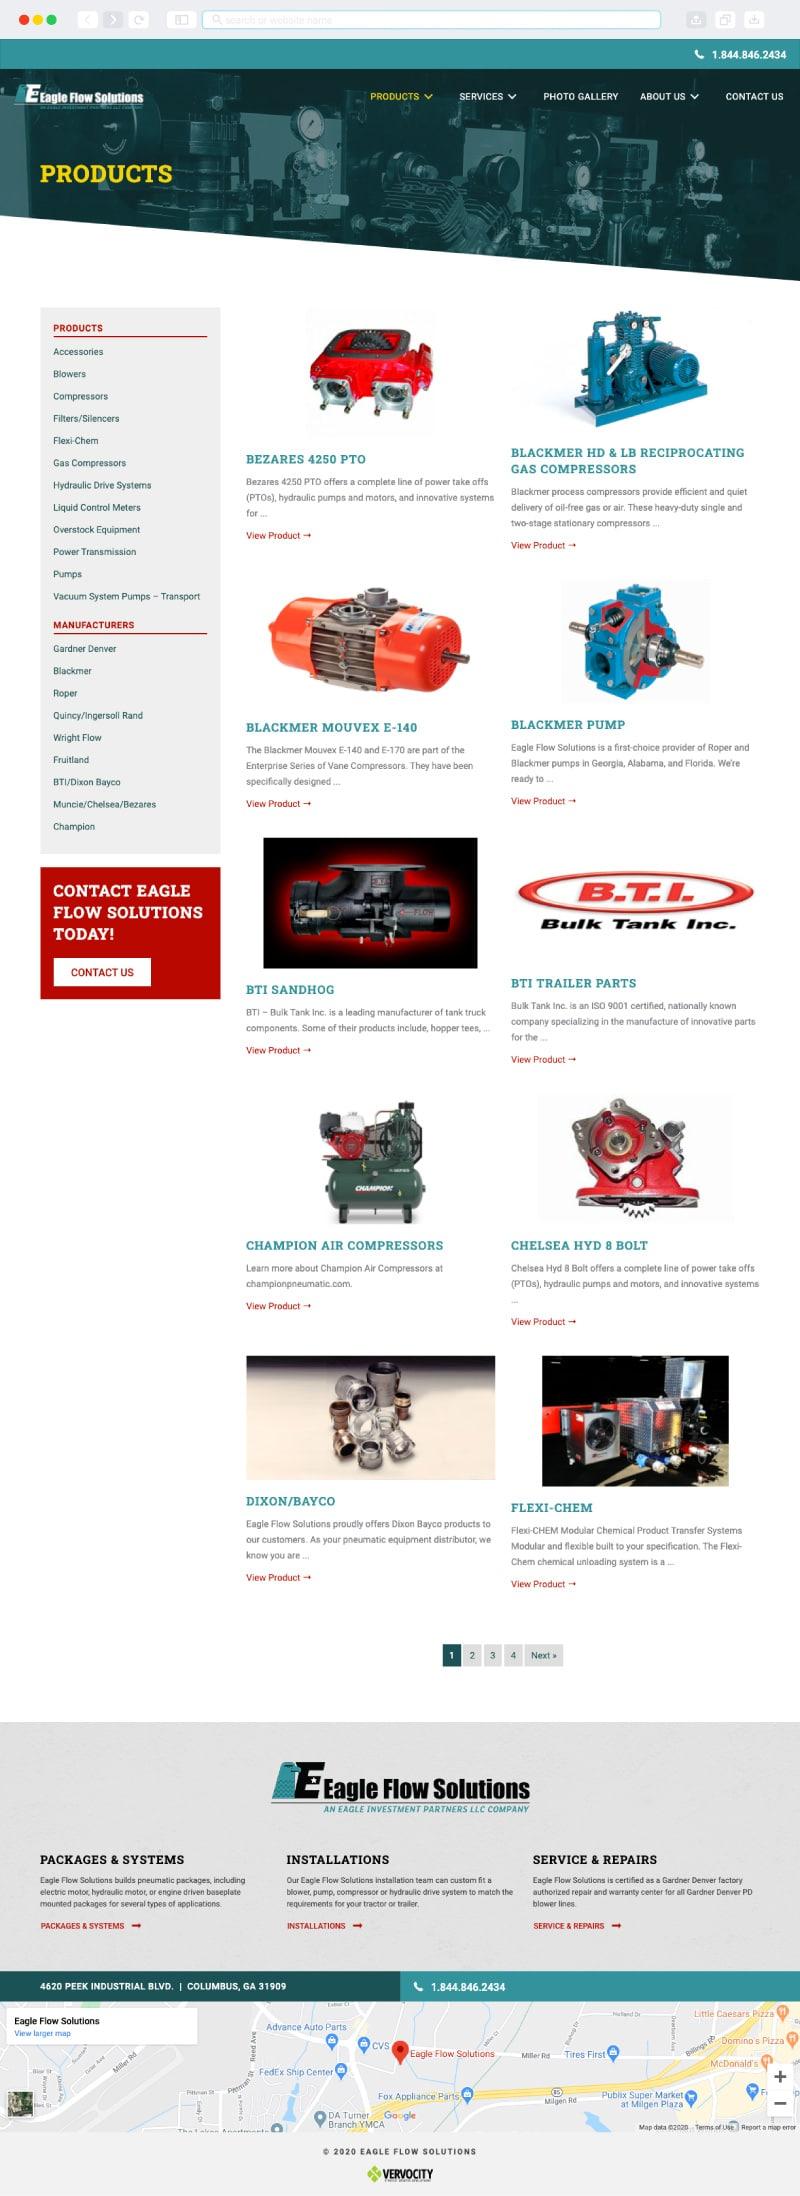 Eagle Flow Solutions Interior Page   Vervocity